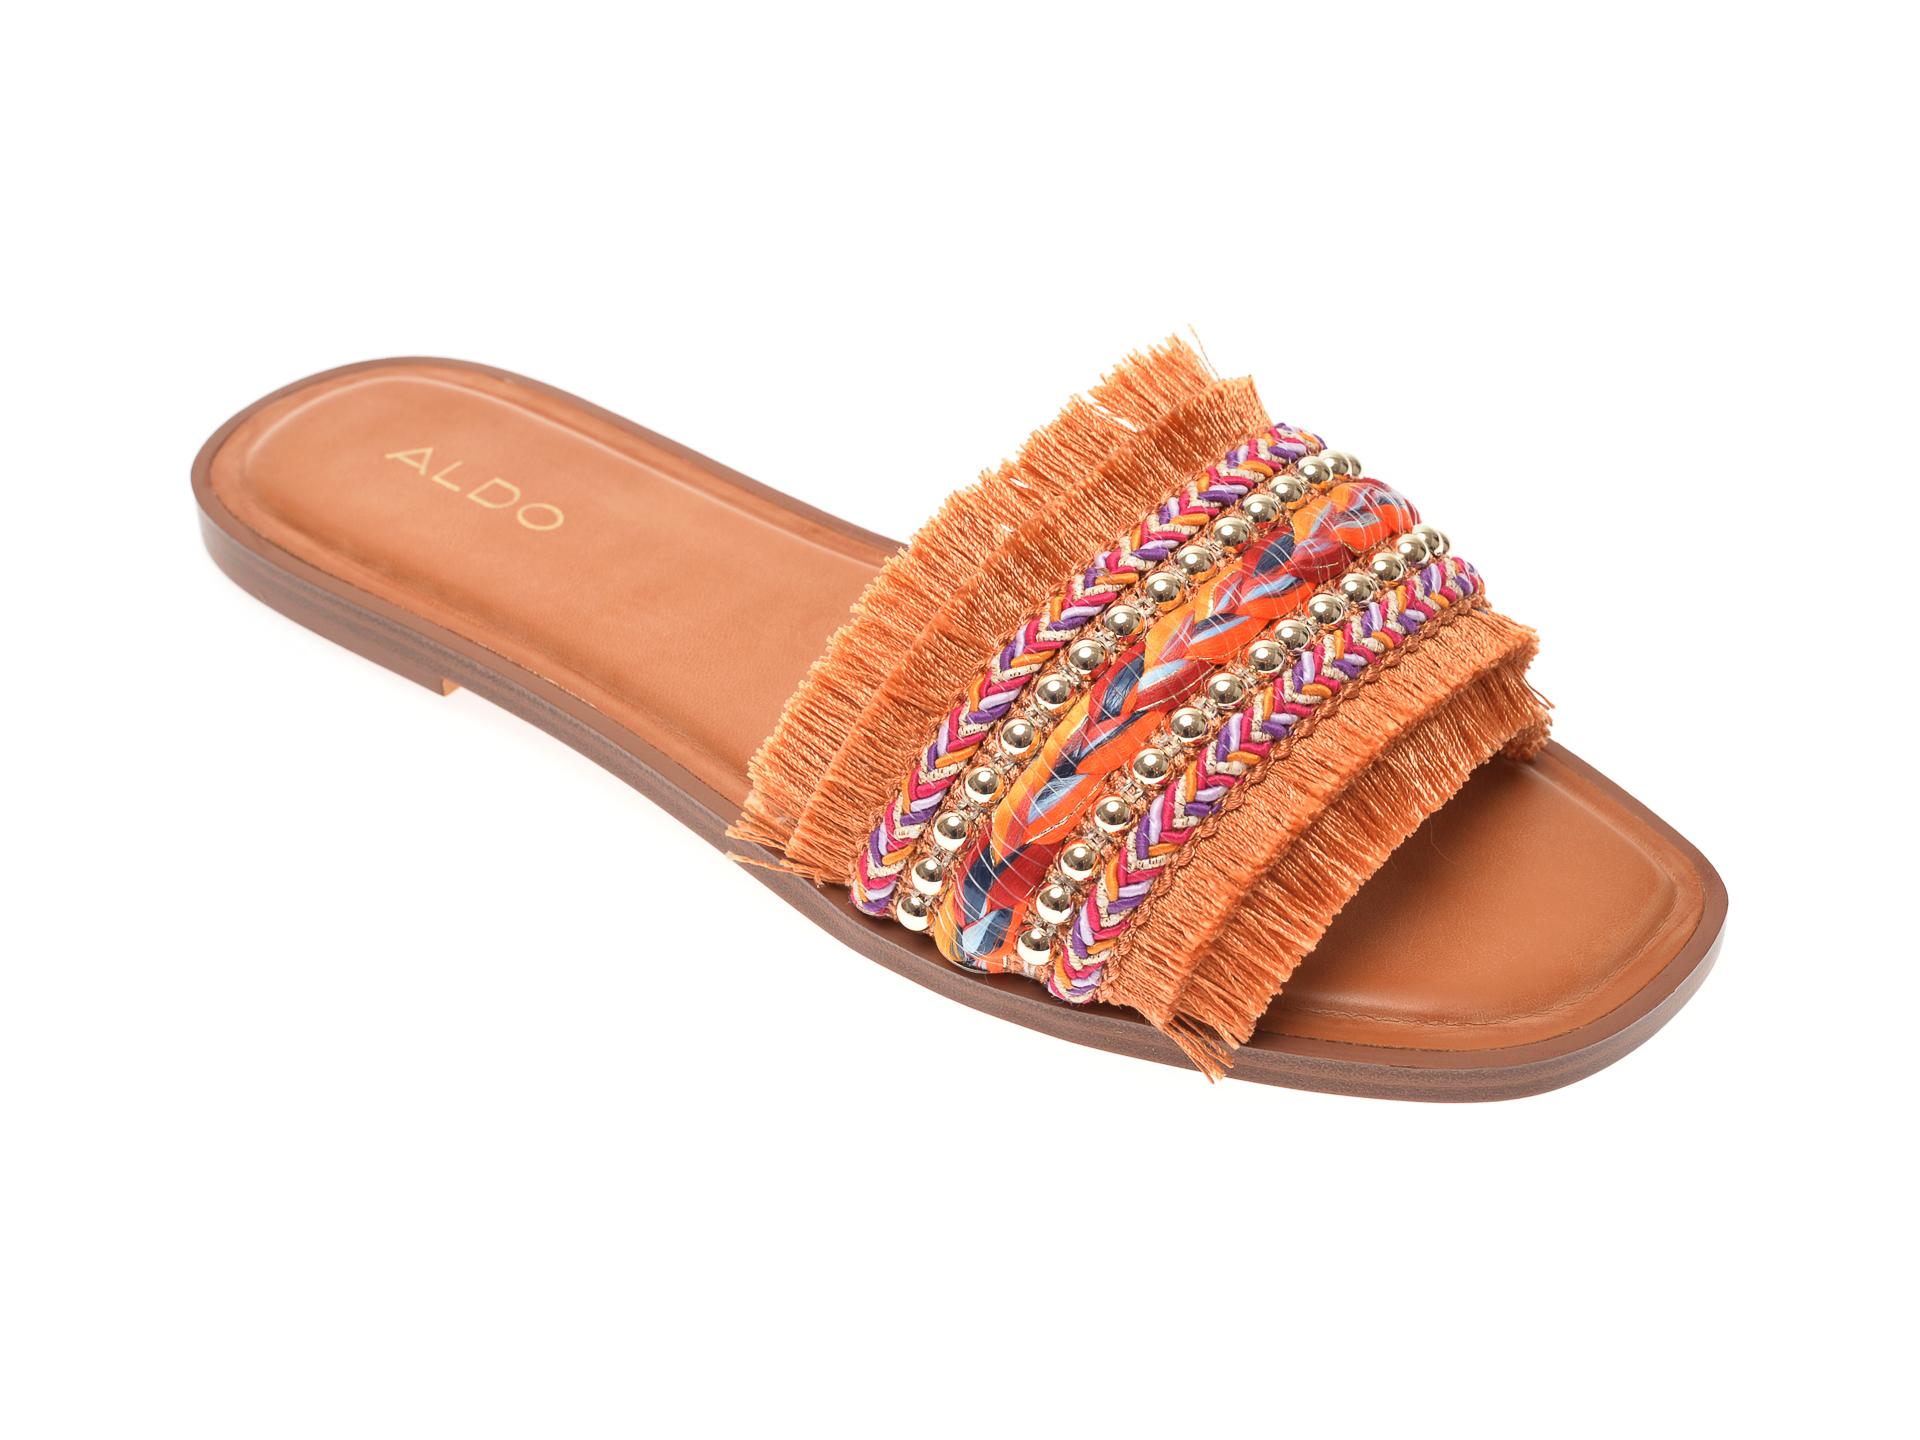 /femei/sandale Dama/sandale Dama Fara Toc